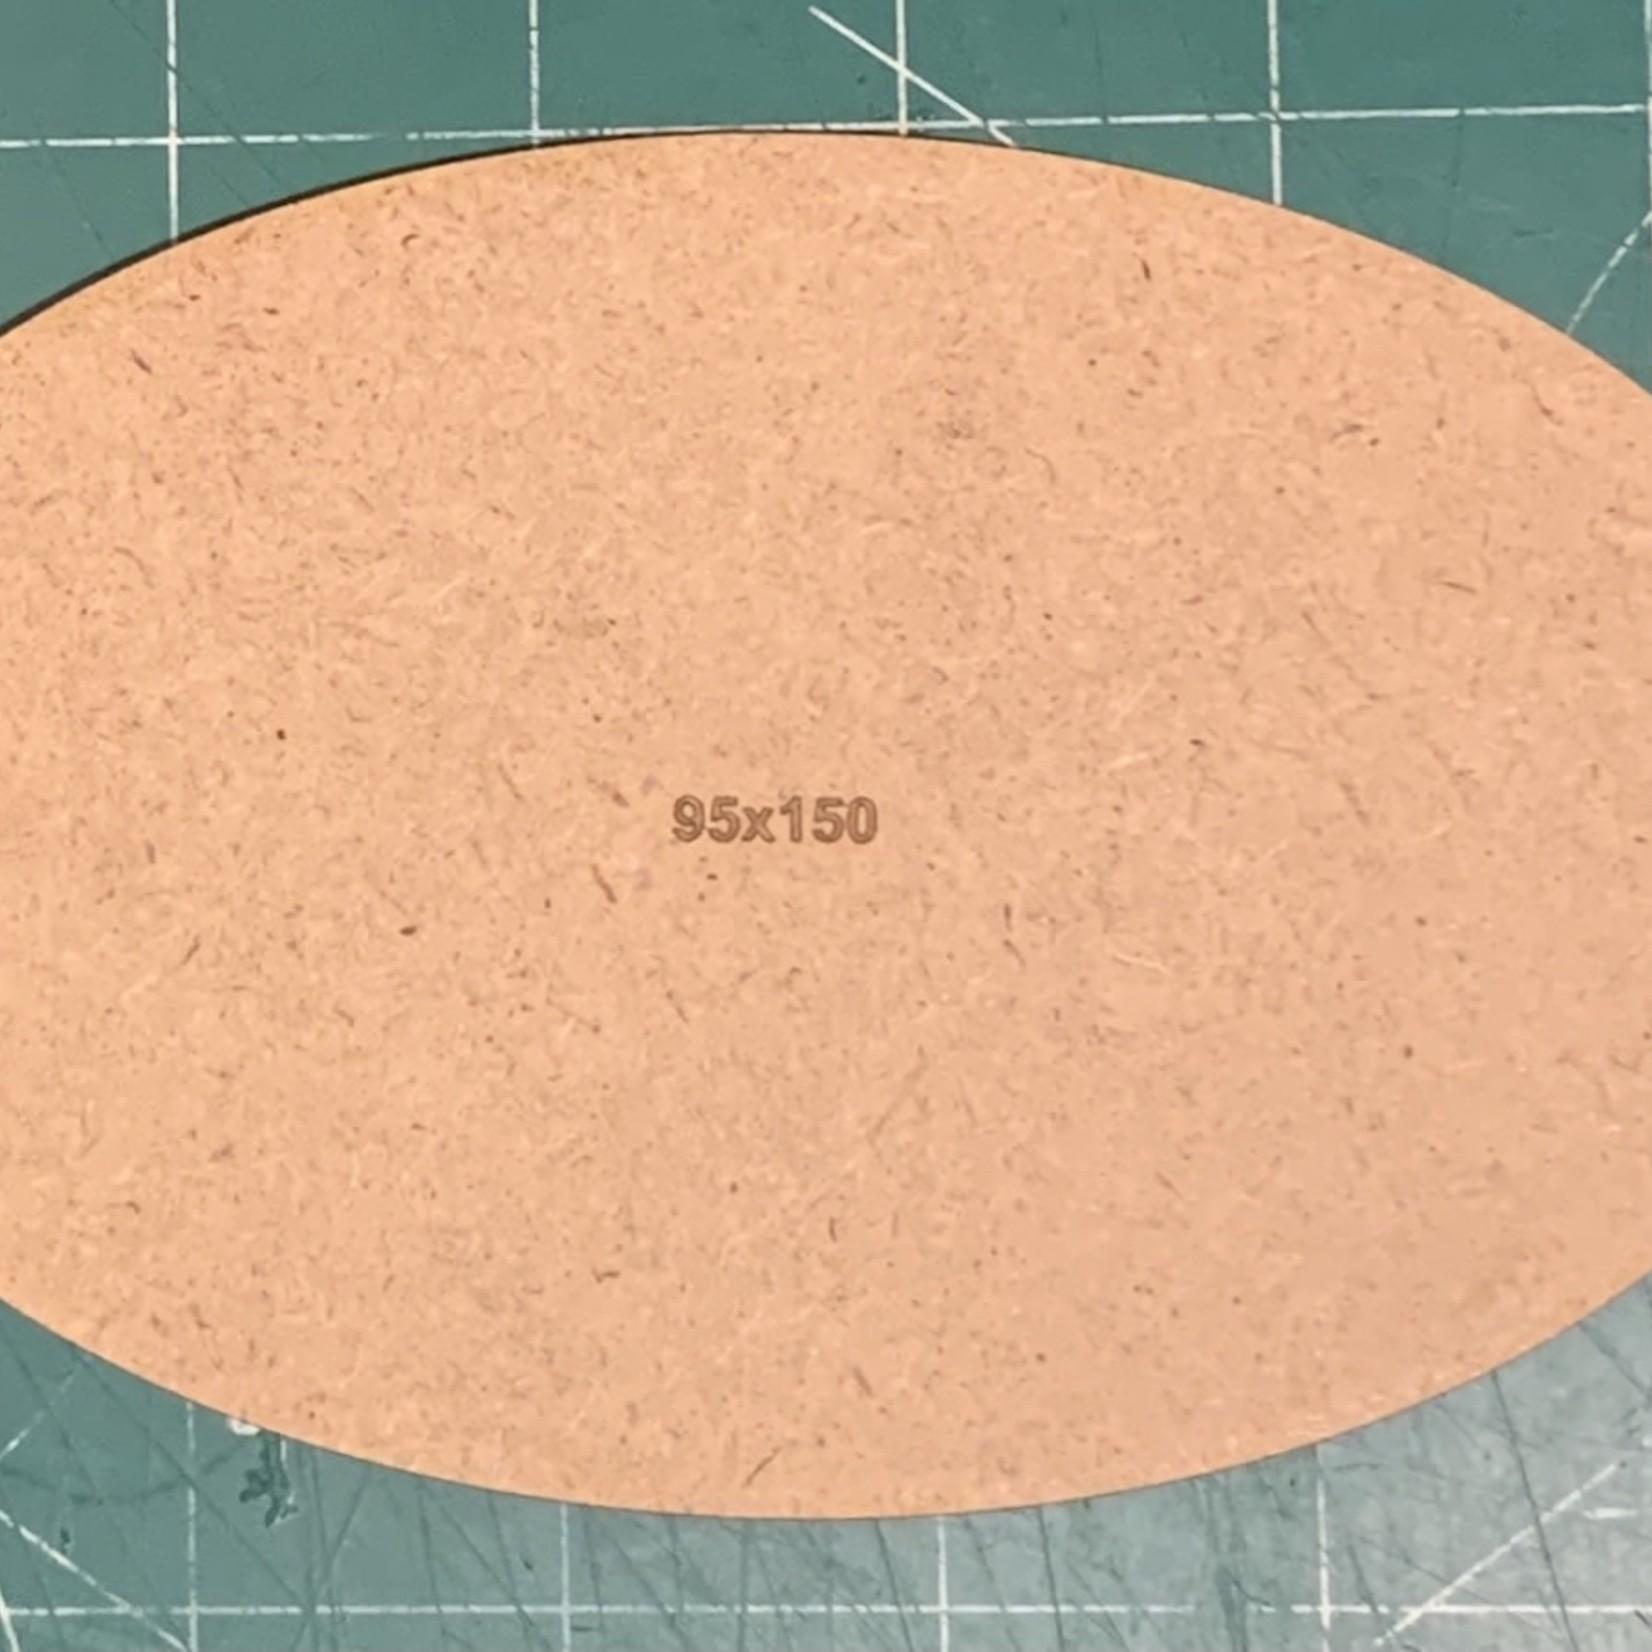 Oval 95 x 150mm MDF Base (x1)